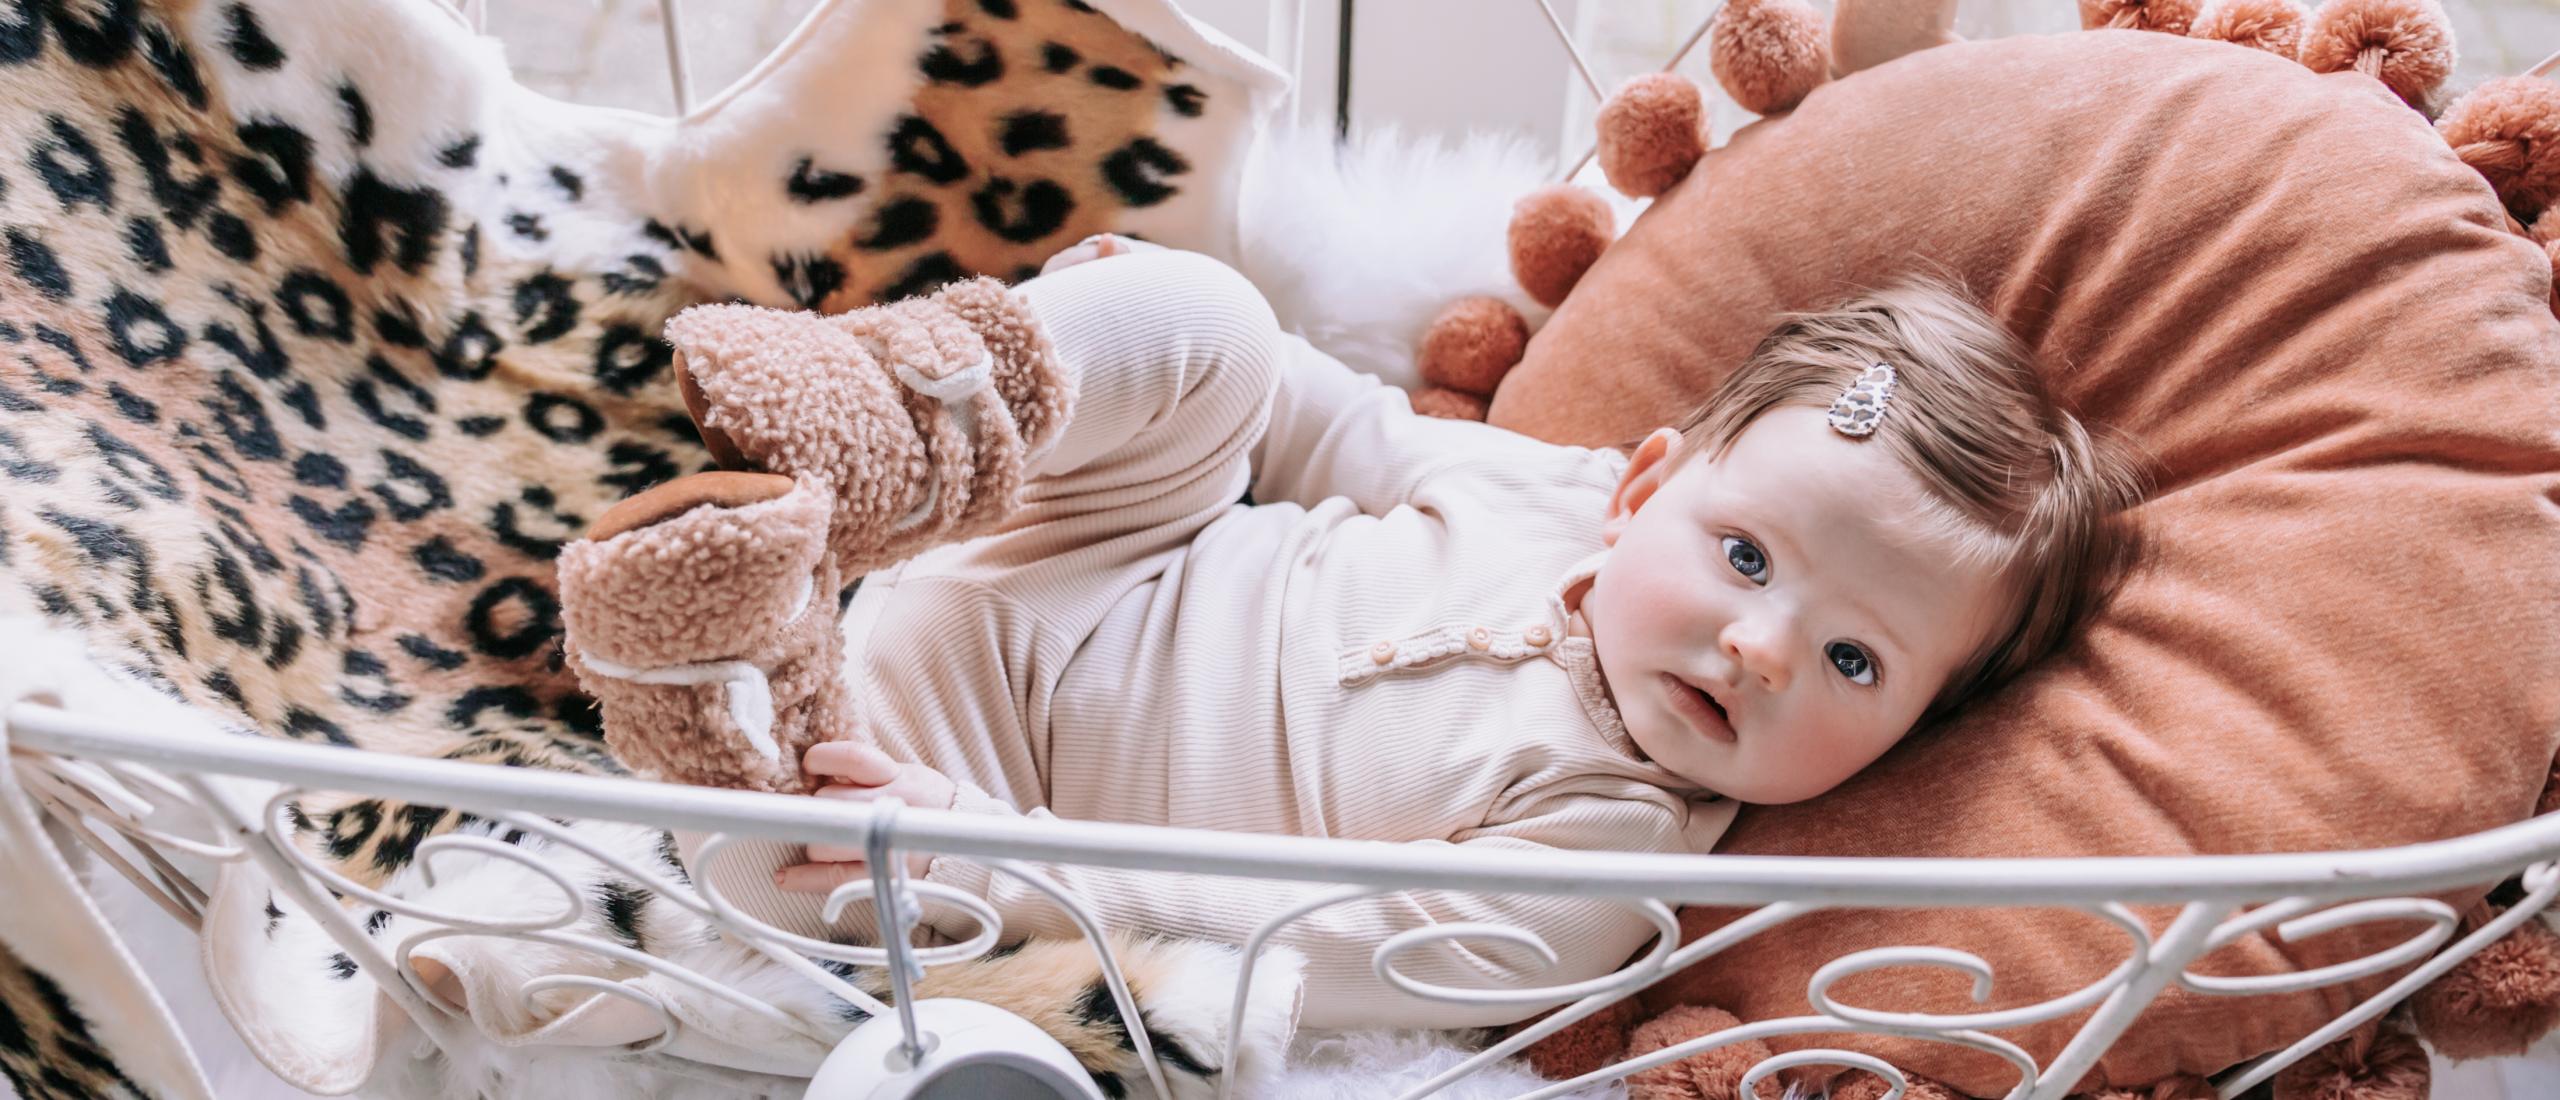 Hoe slaapt je baby veilig?